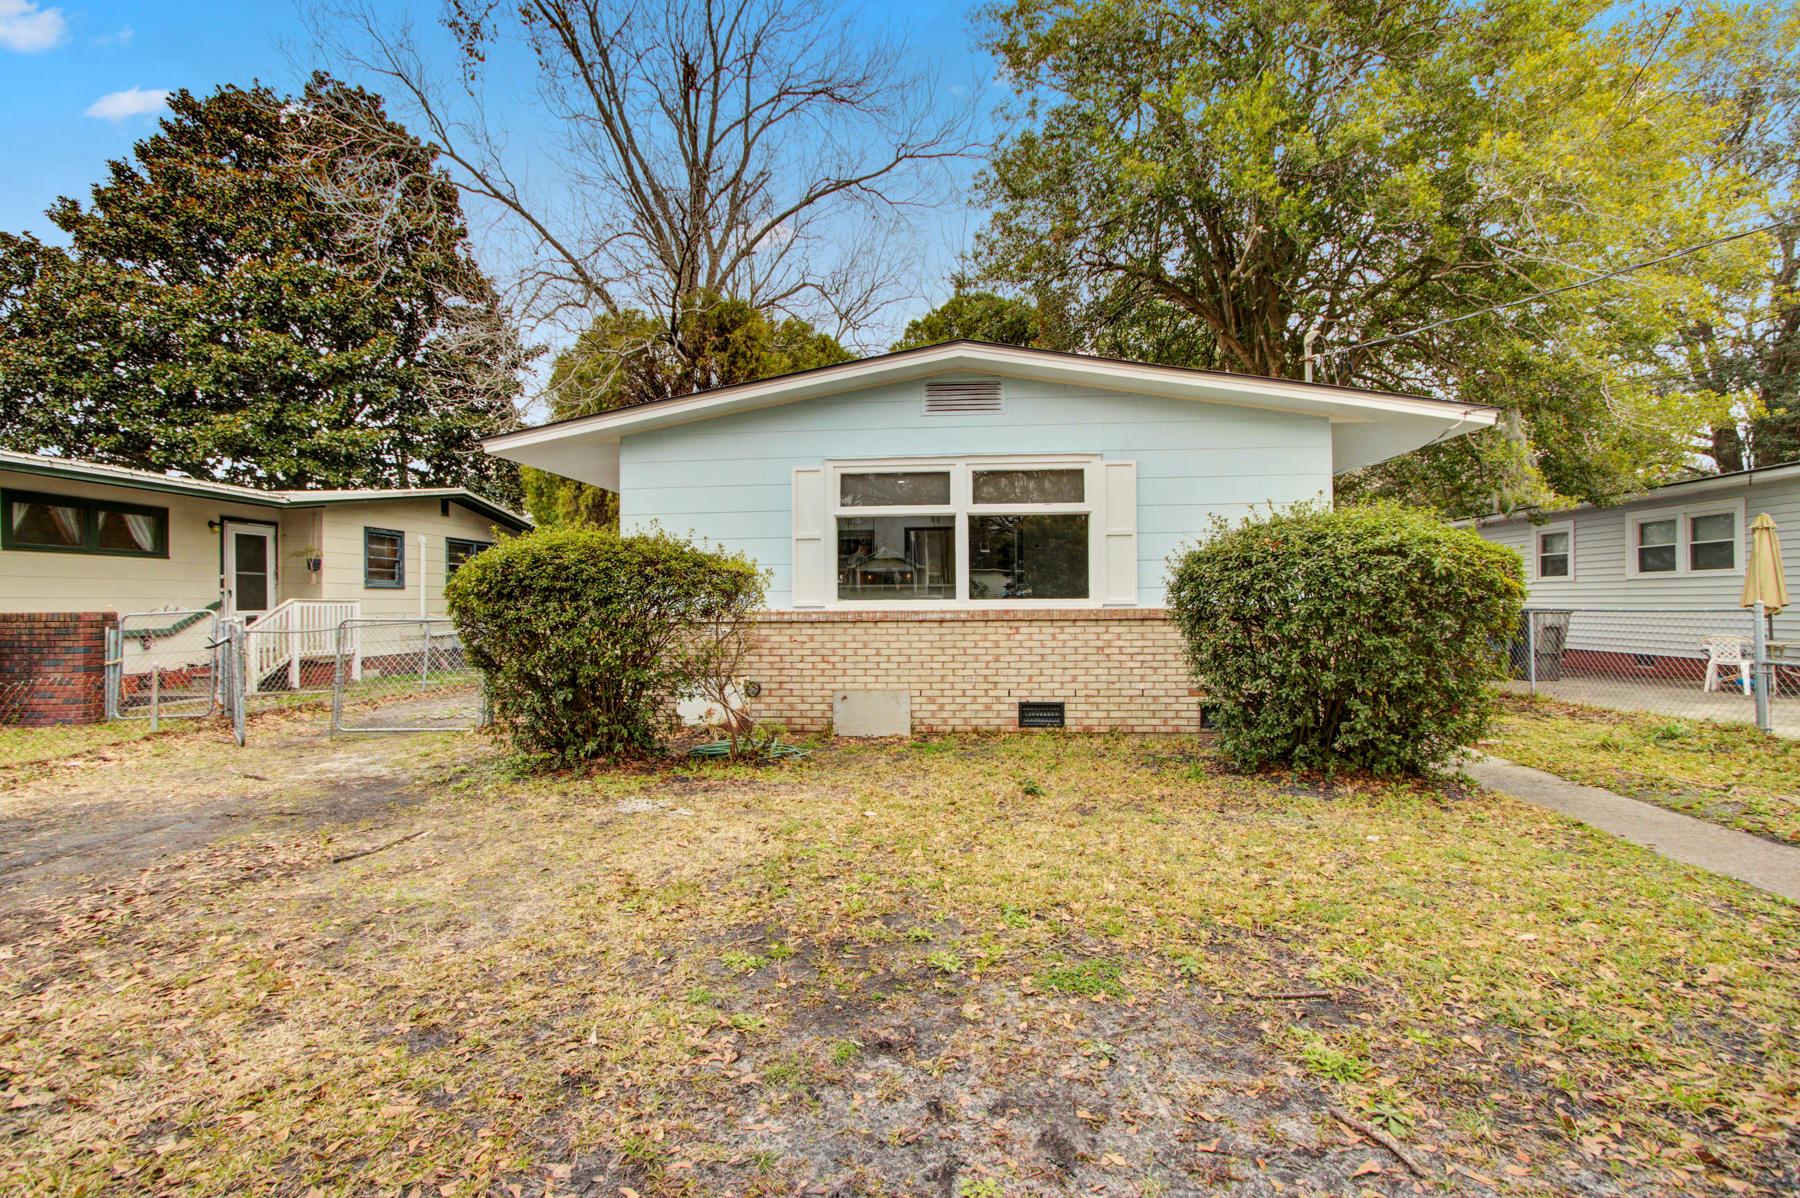 Port Park Homes For Sale - 5820 Sledge, Hanahan, SC - 22